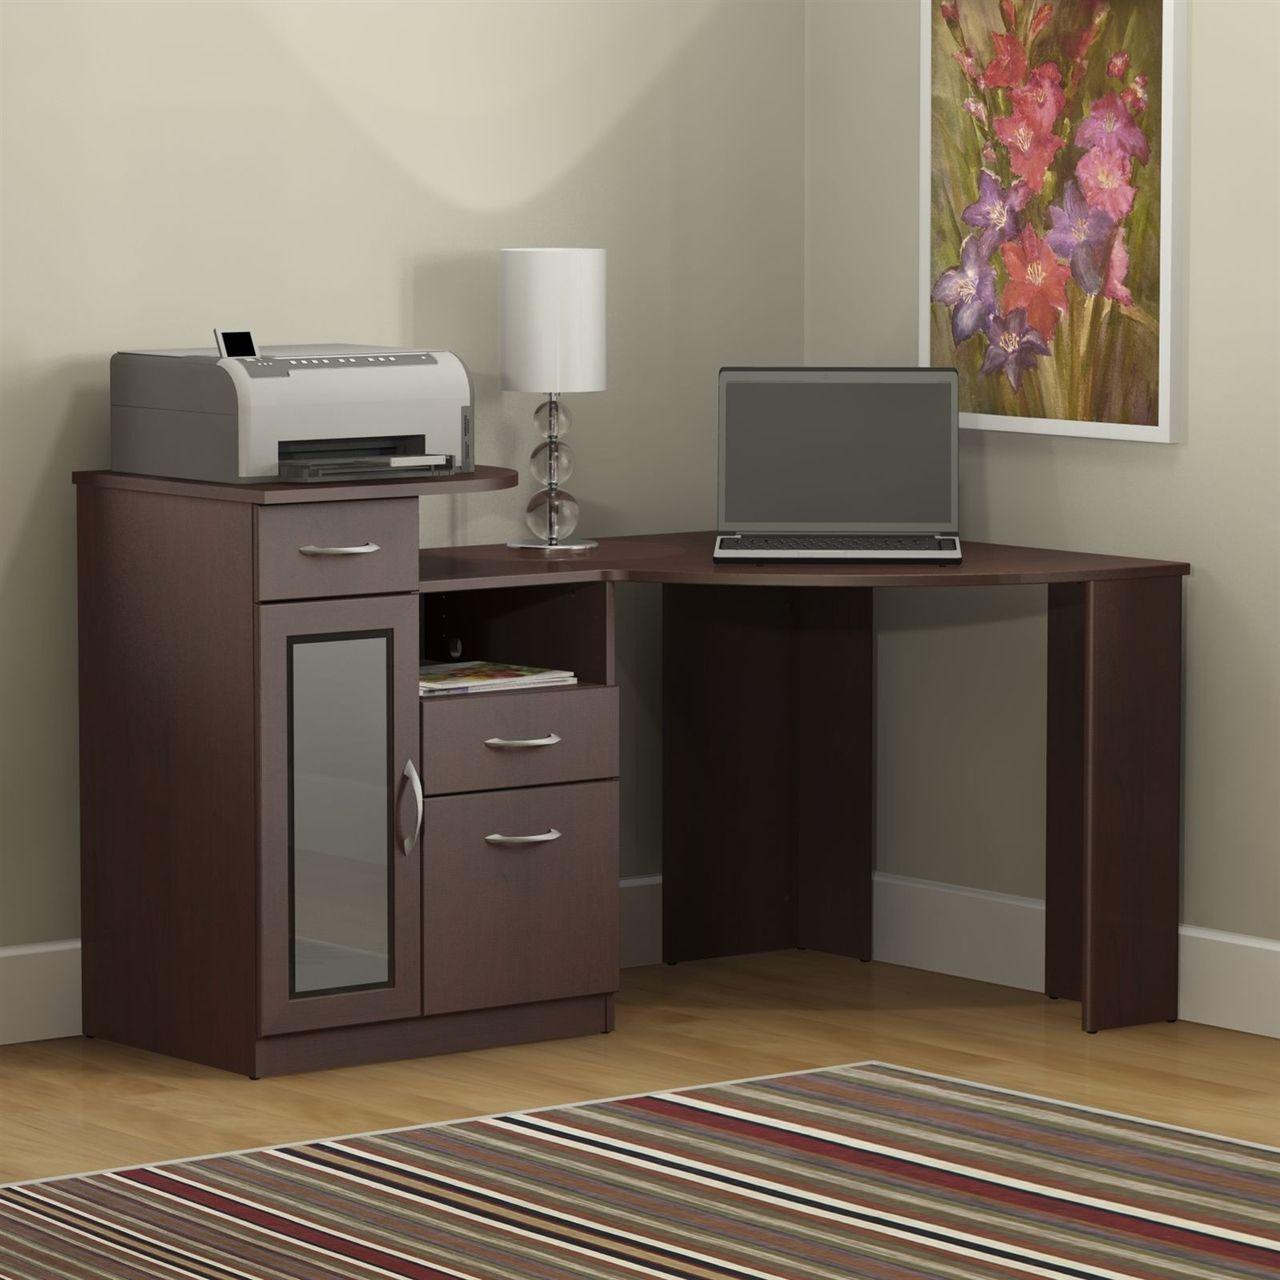 Medium Wood Finish Corner Computer Desk With Printer Shelf Corner Writing Desk Black Corner Computer Desk Home Office Computer Desk